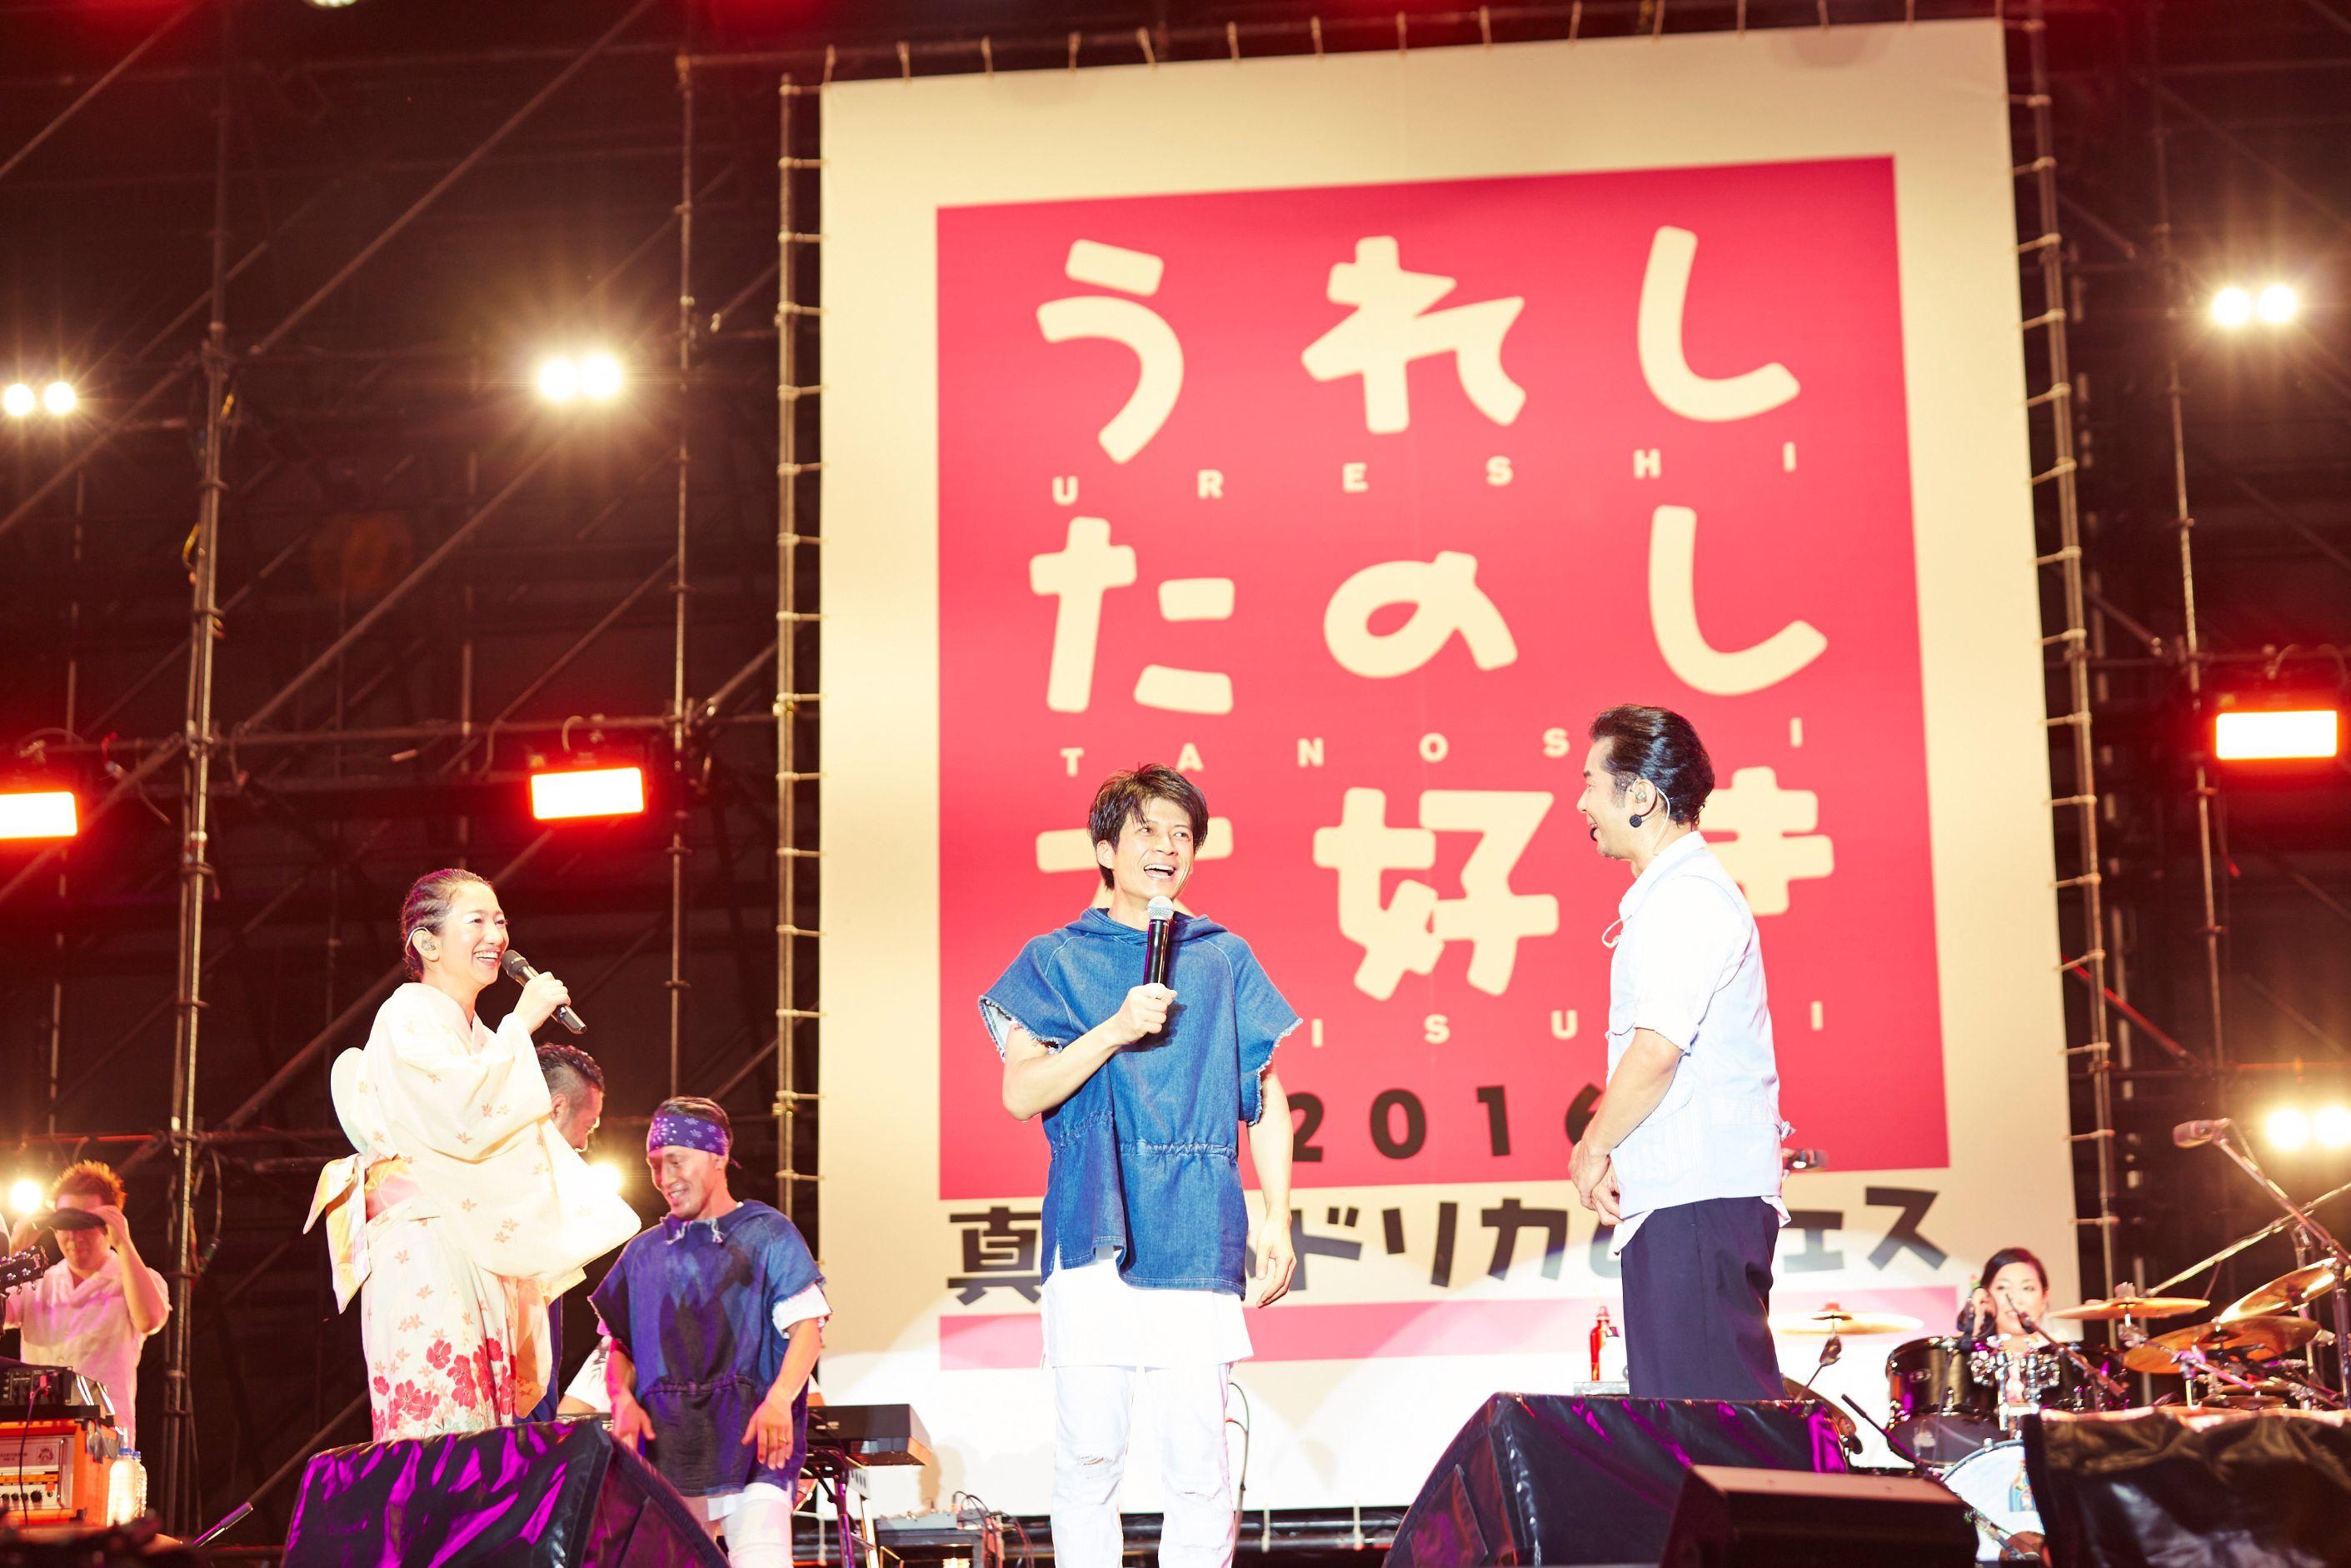 Photo:植松千波 / 橋本塁(SOUND SHOOTER)(C)フジテレビ